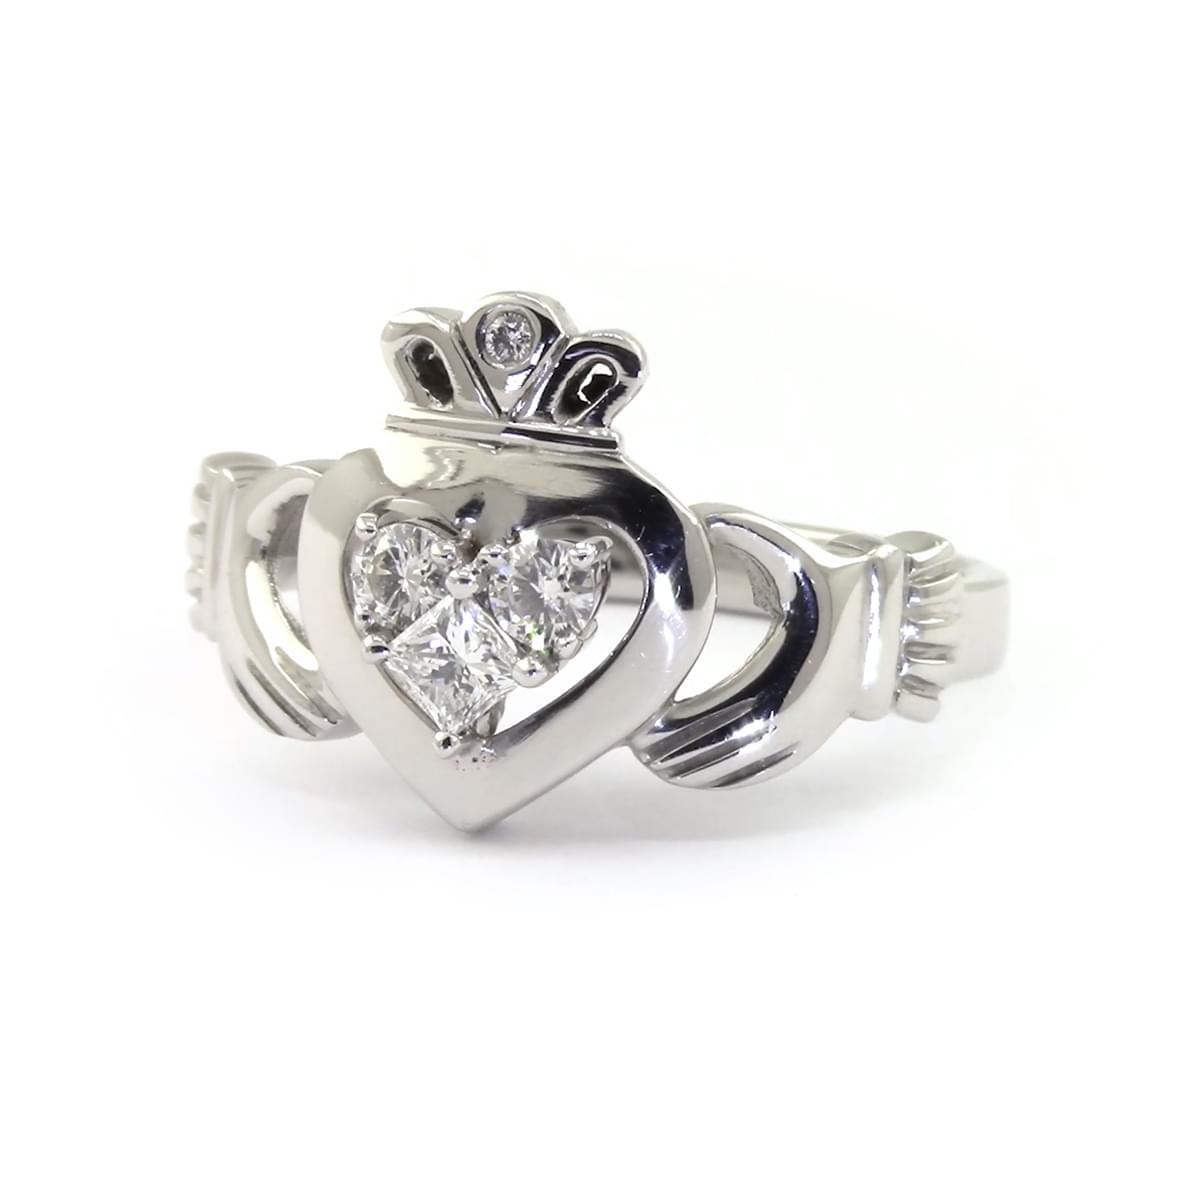 White Gold 3 Stone Diamond Claddagh Engagement Ring